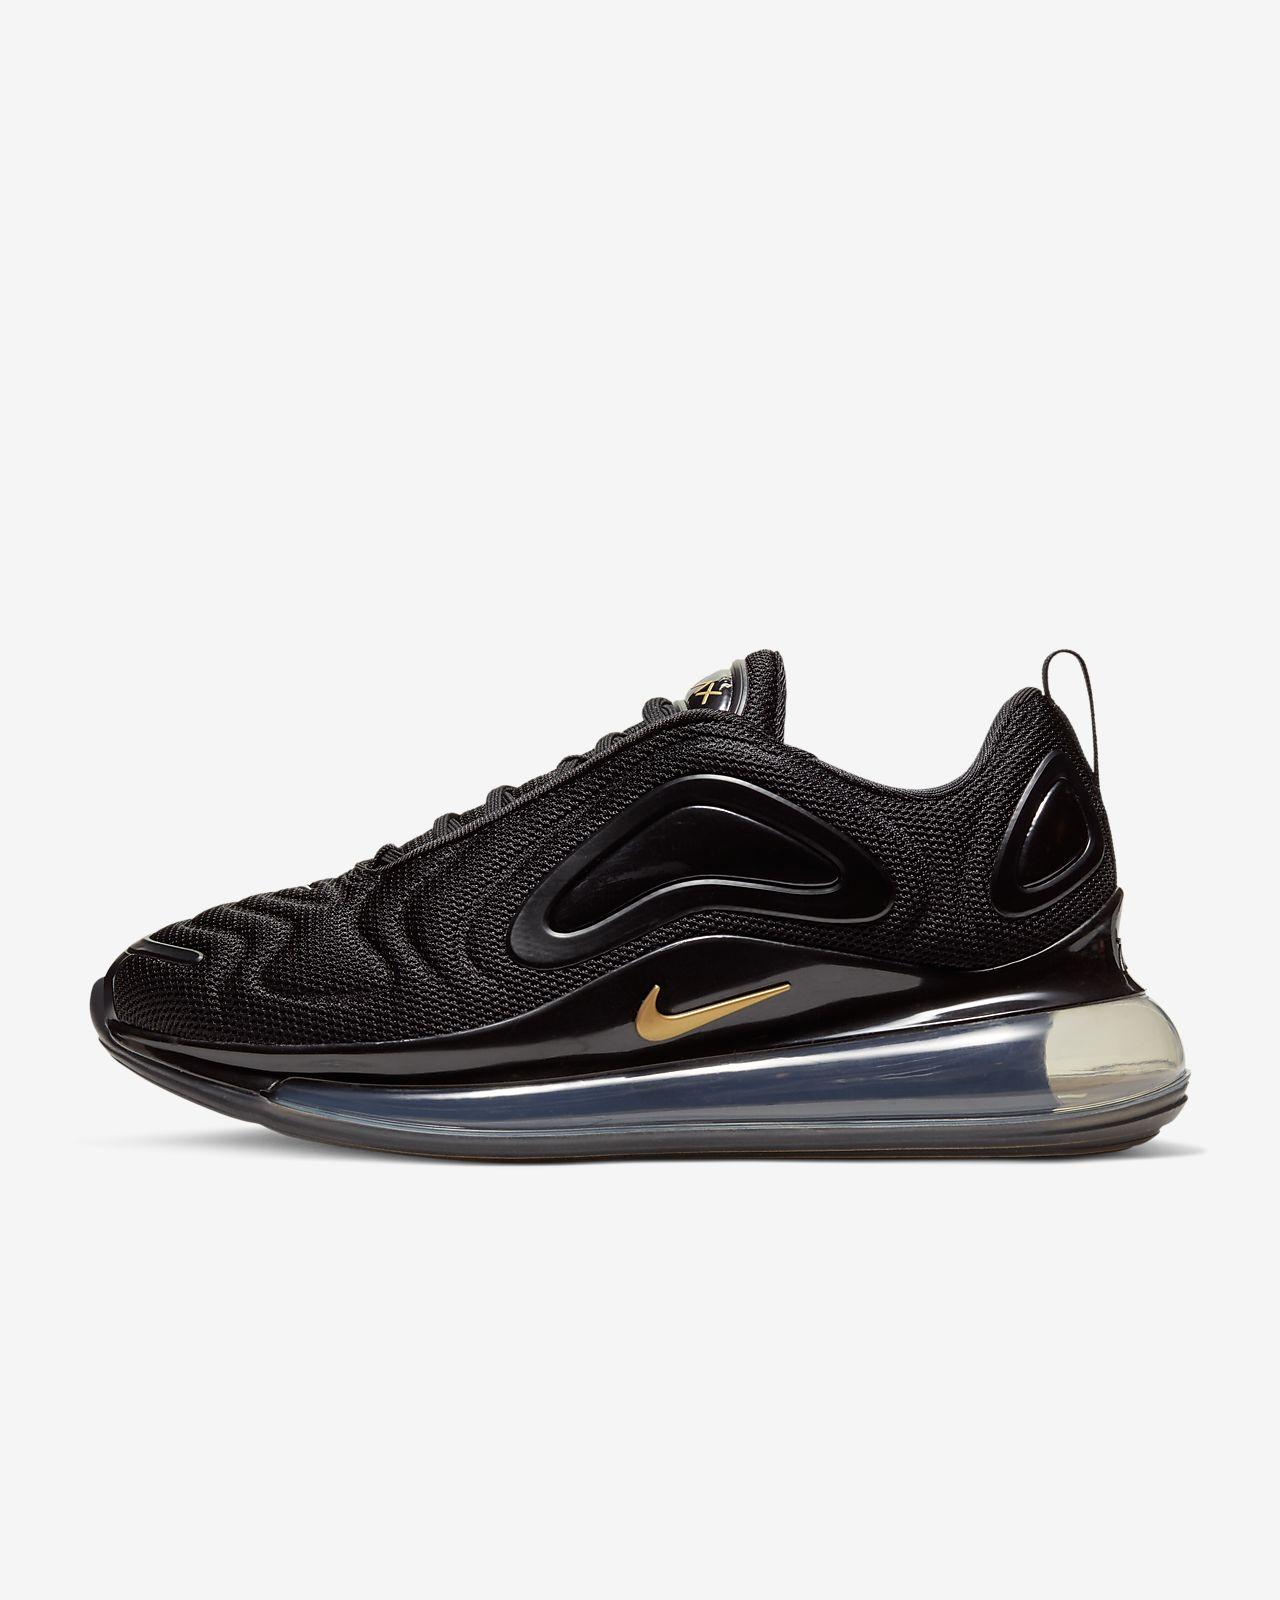 Nike Air Max 720 Shoe